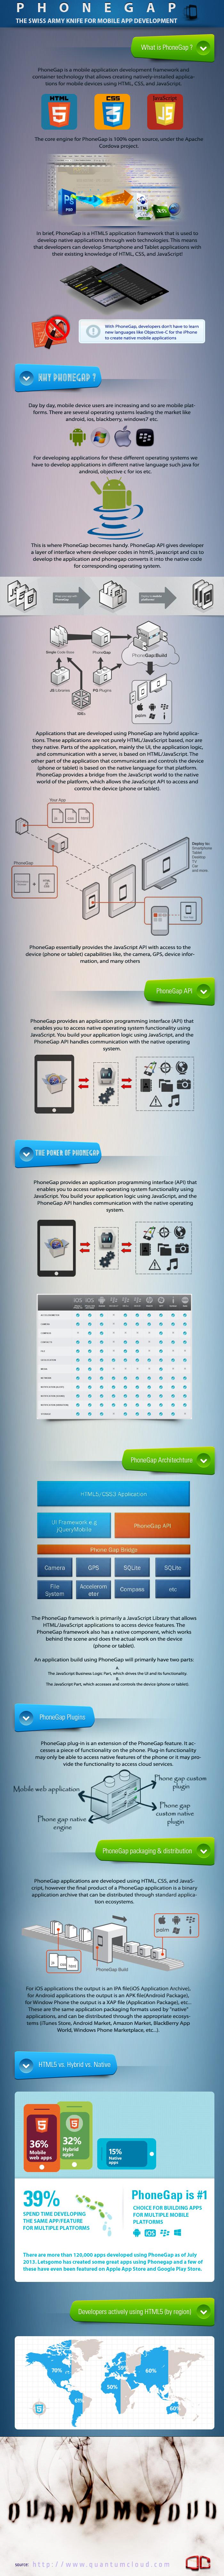 Benefits of Using PhoneGap for Mobile Application Development